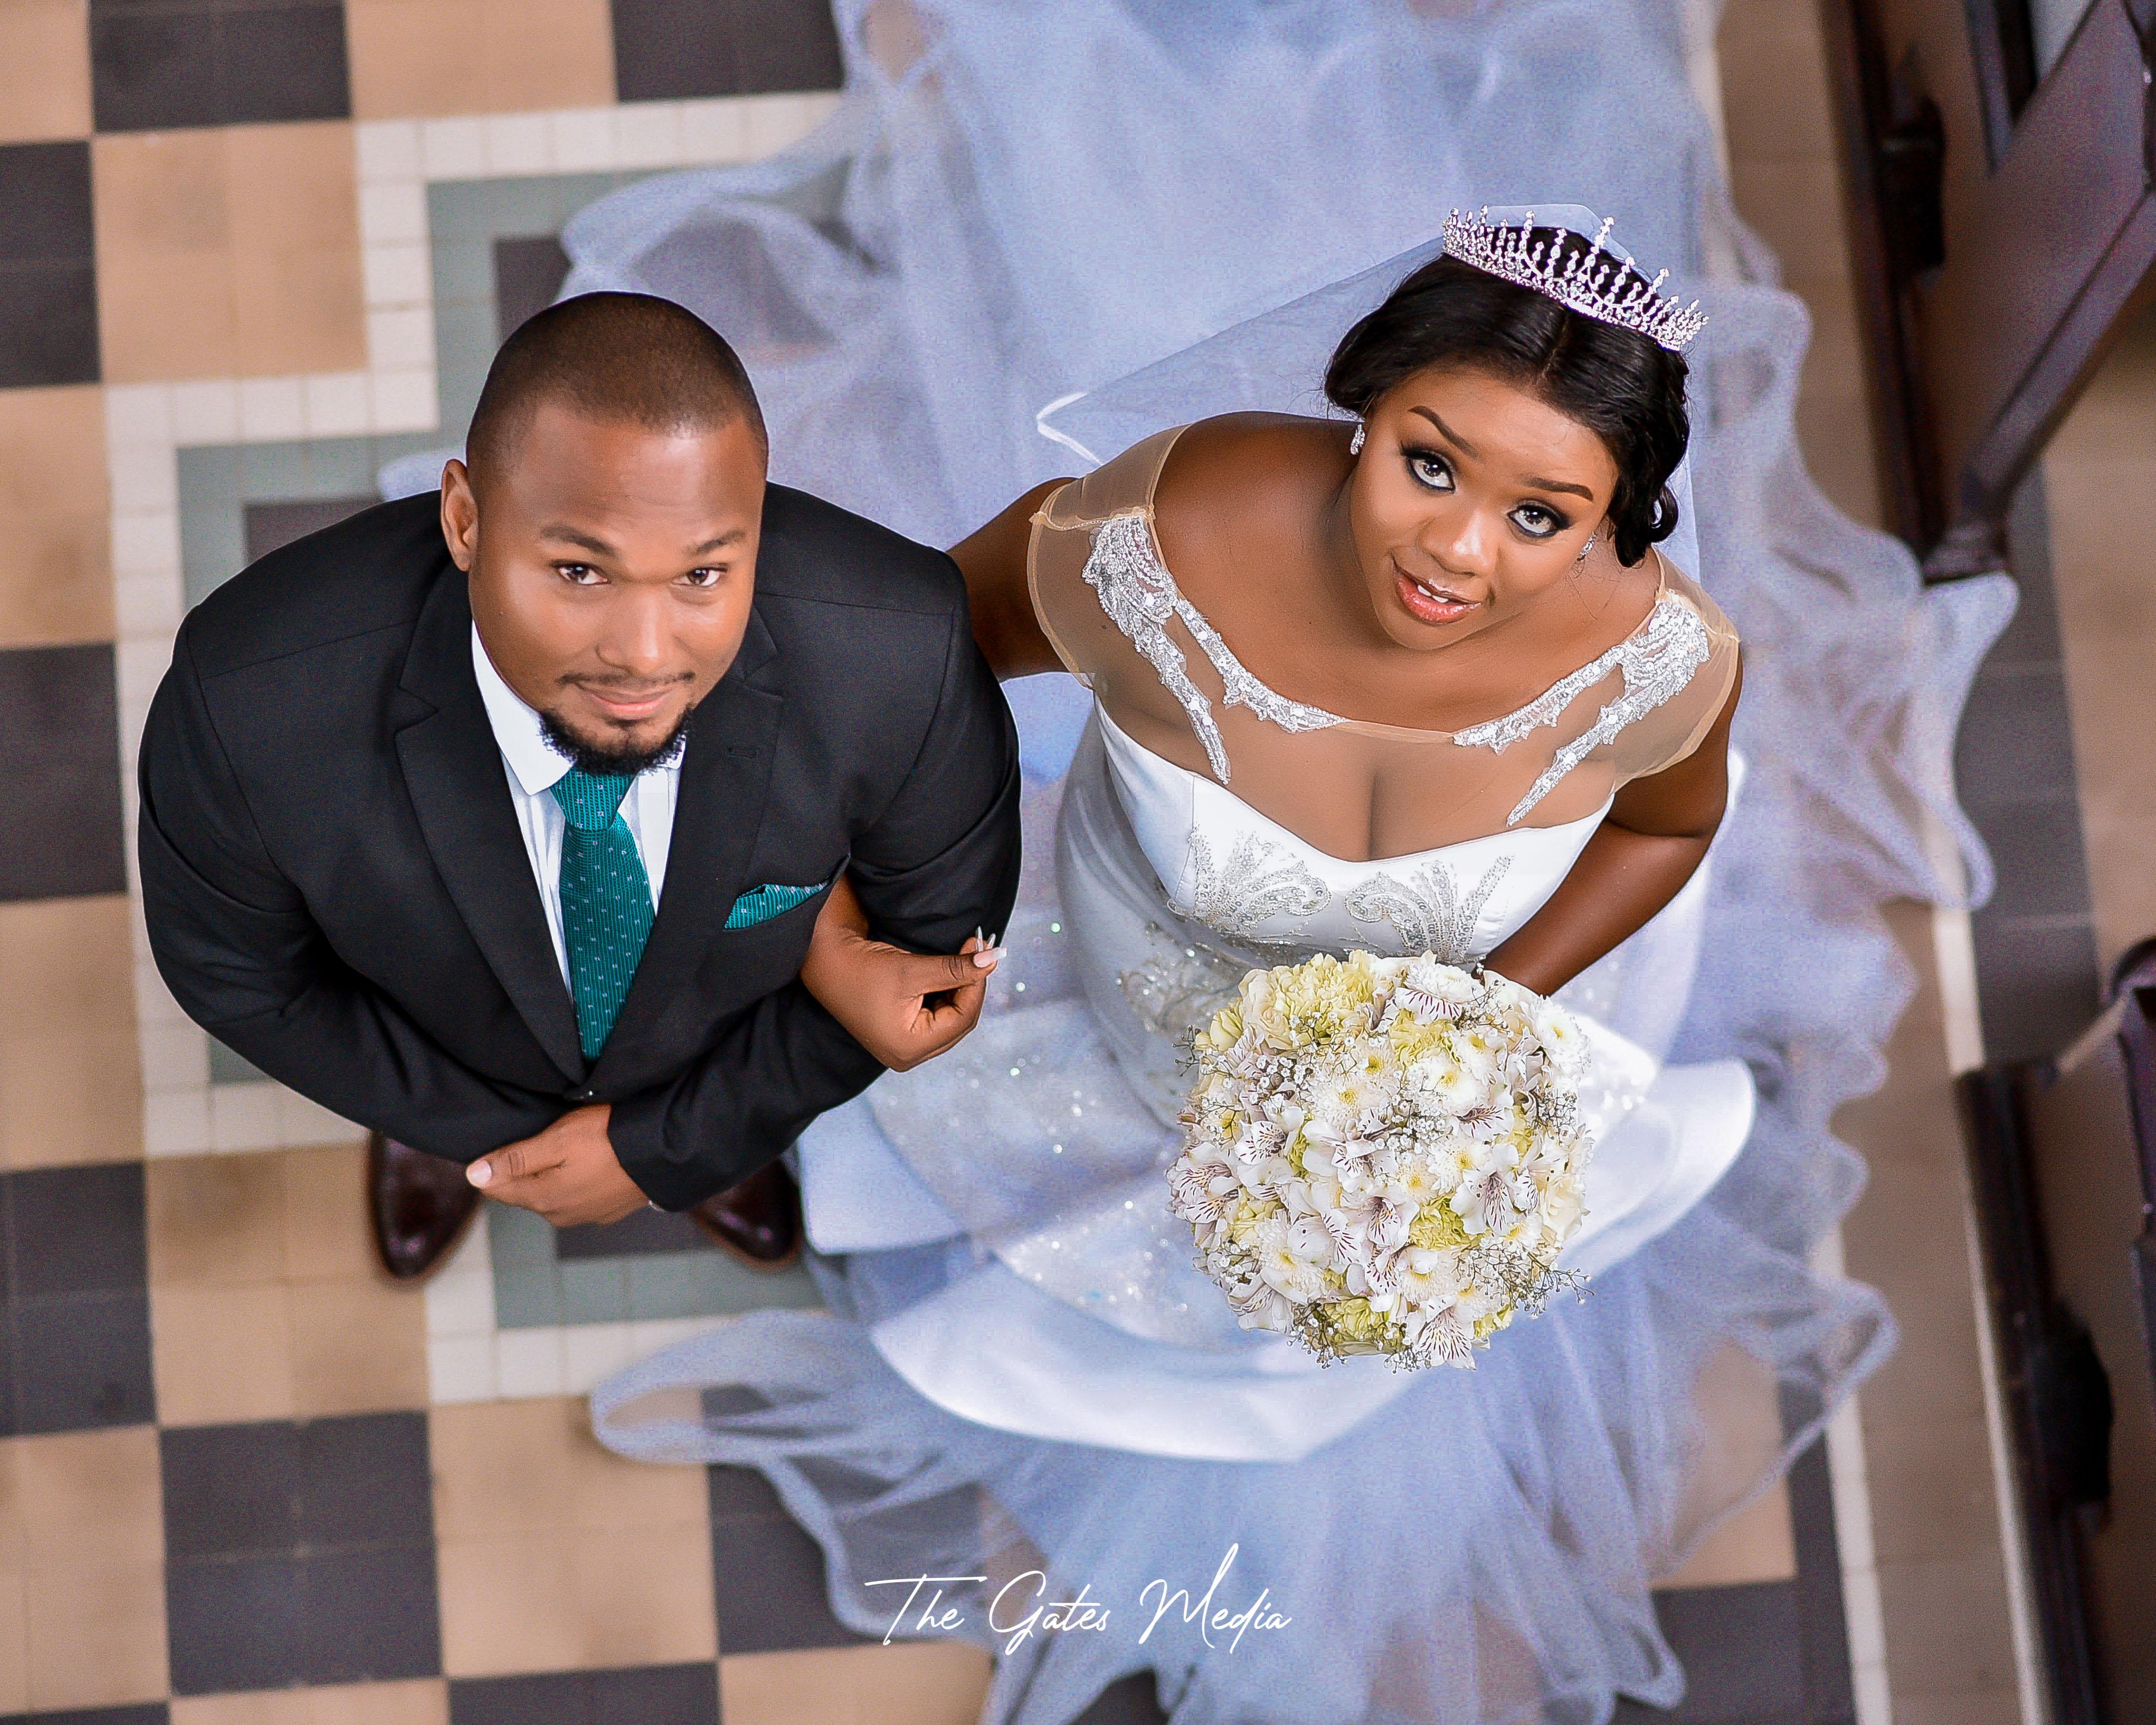 Elias & Marrystelah on their wedding day